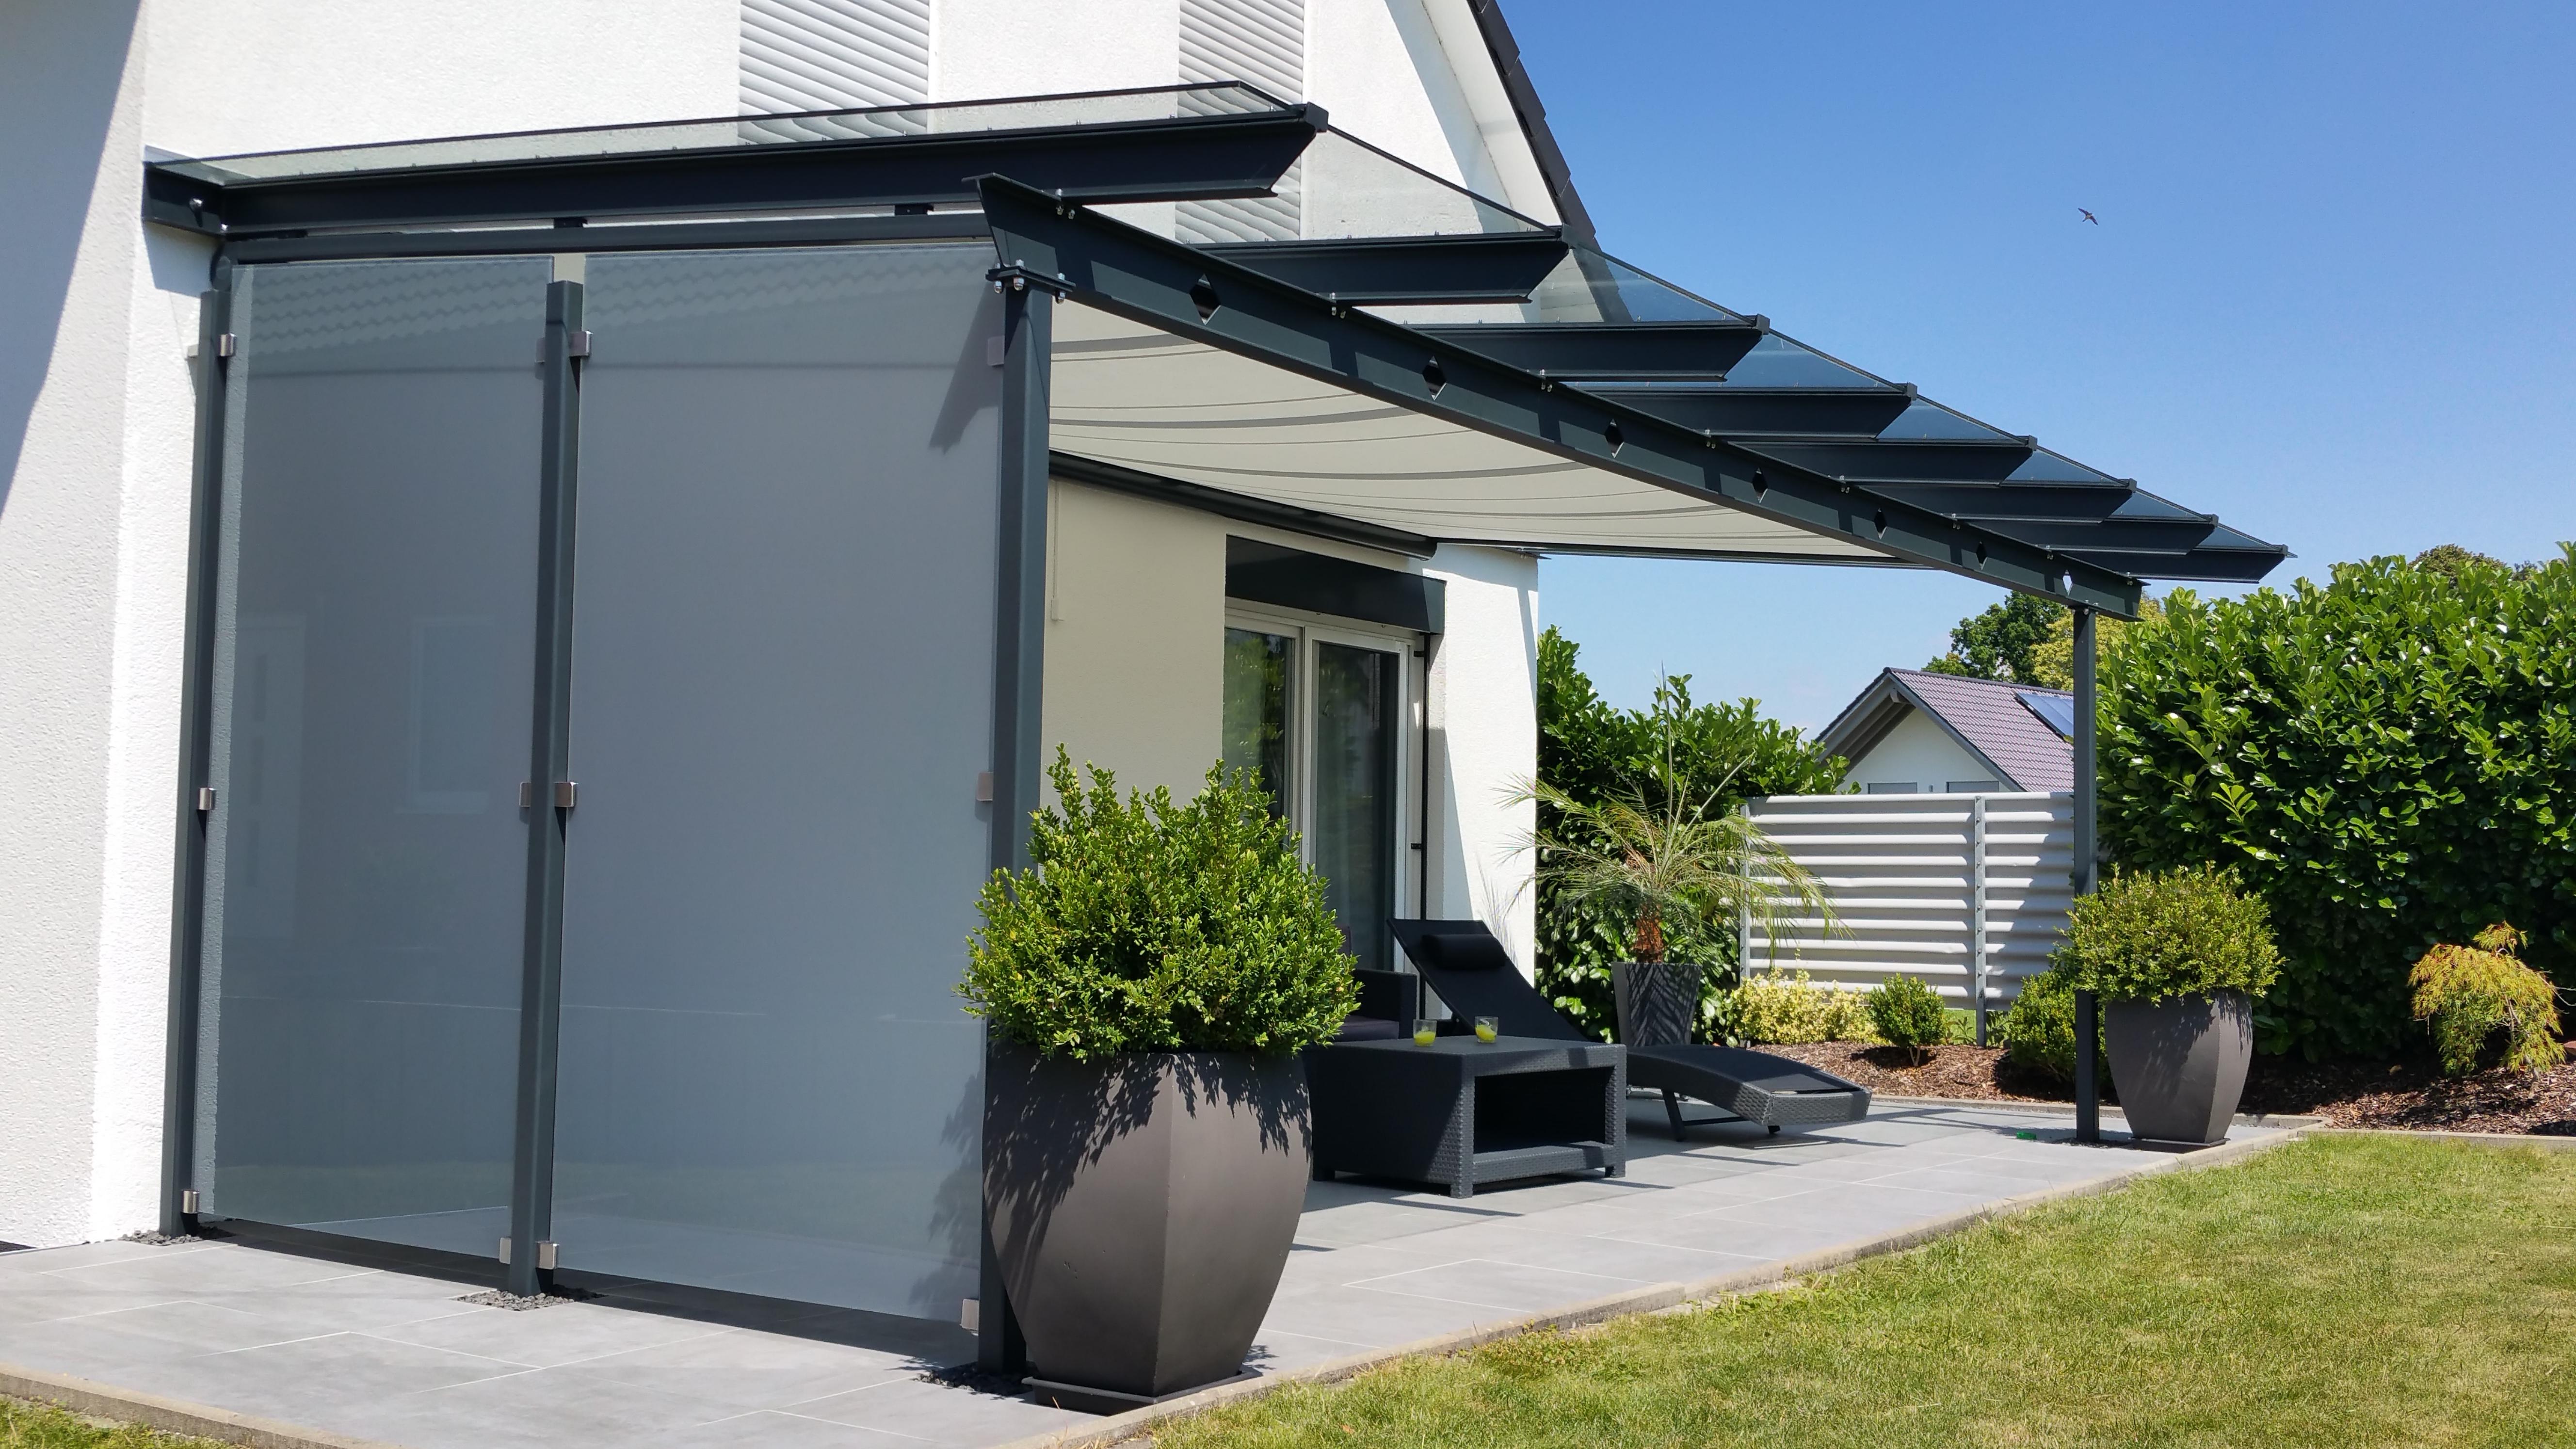 terrassen berdachung mit windfang aus glas g ppingen stahlbau n gele. Black Bedroom Furniture Sets. Home Design Ideas